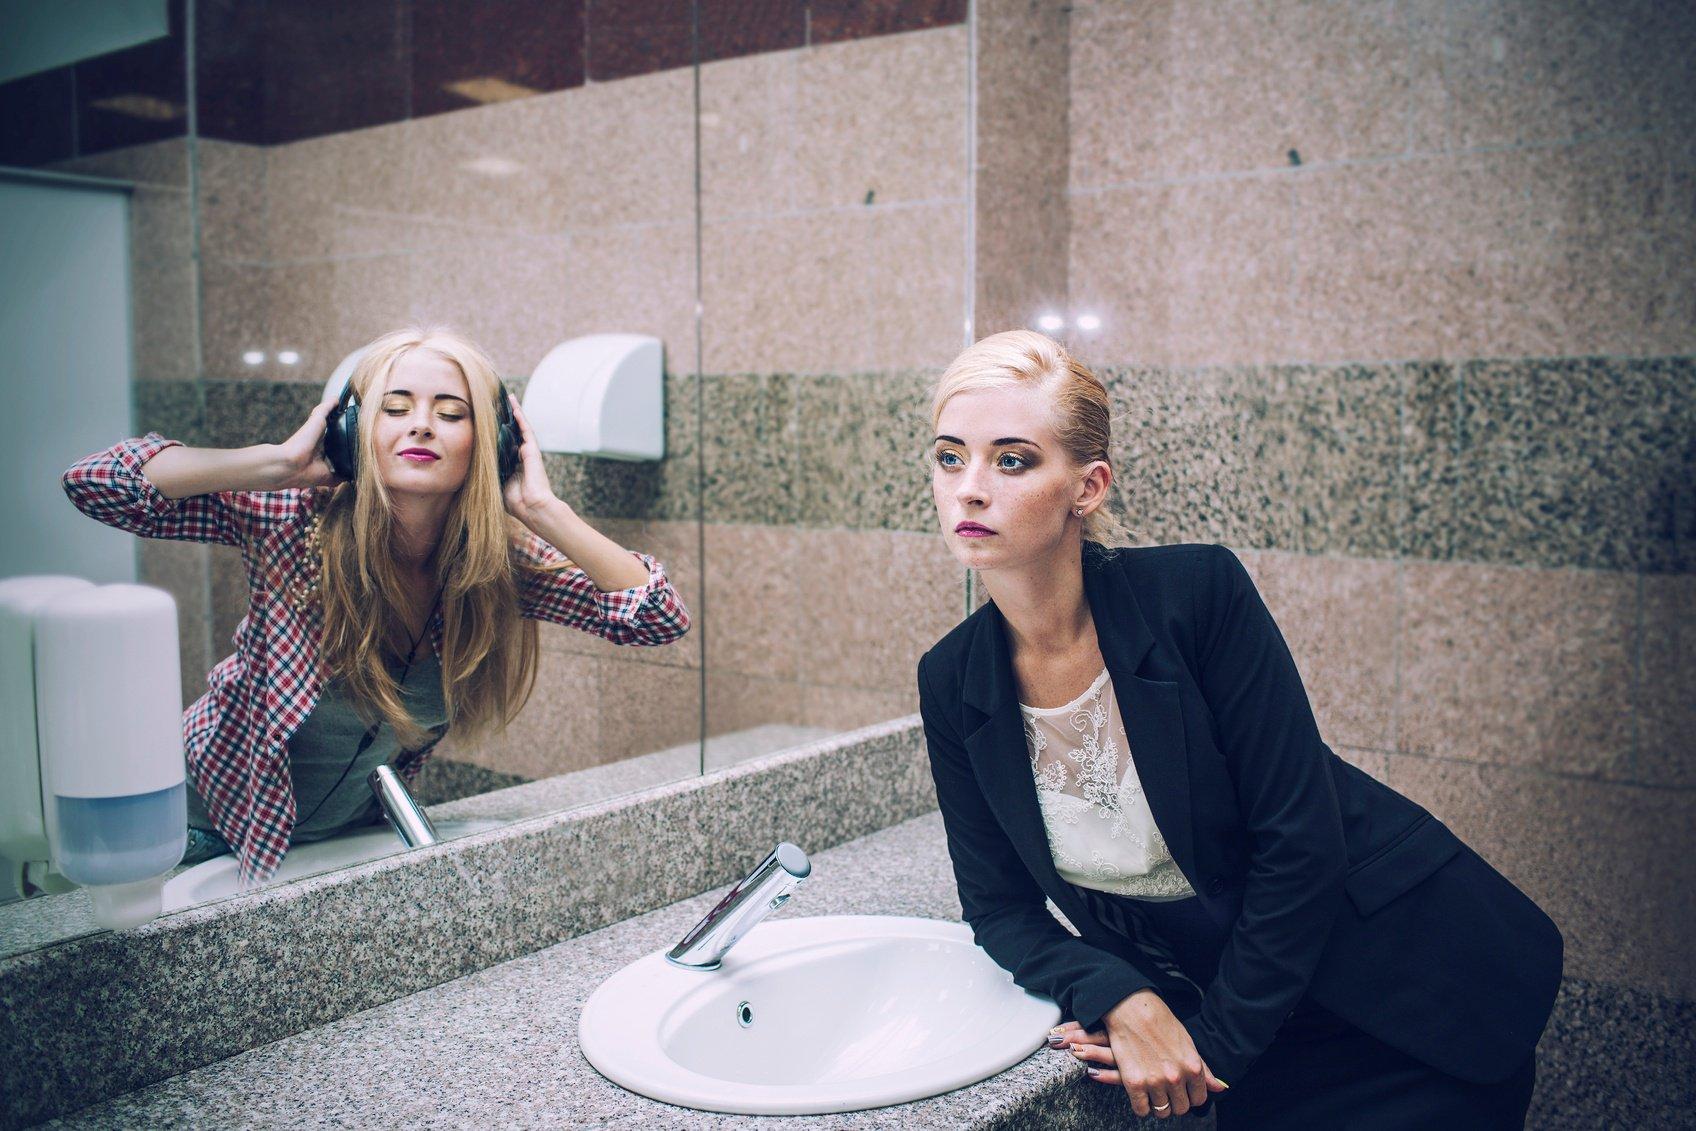 Woman in bathroom